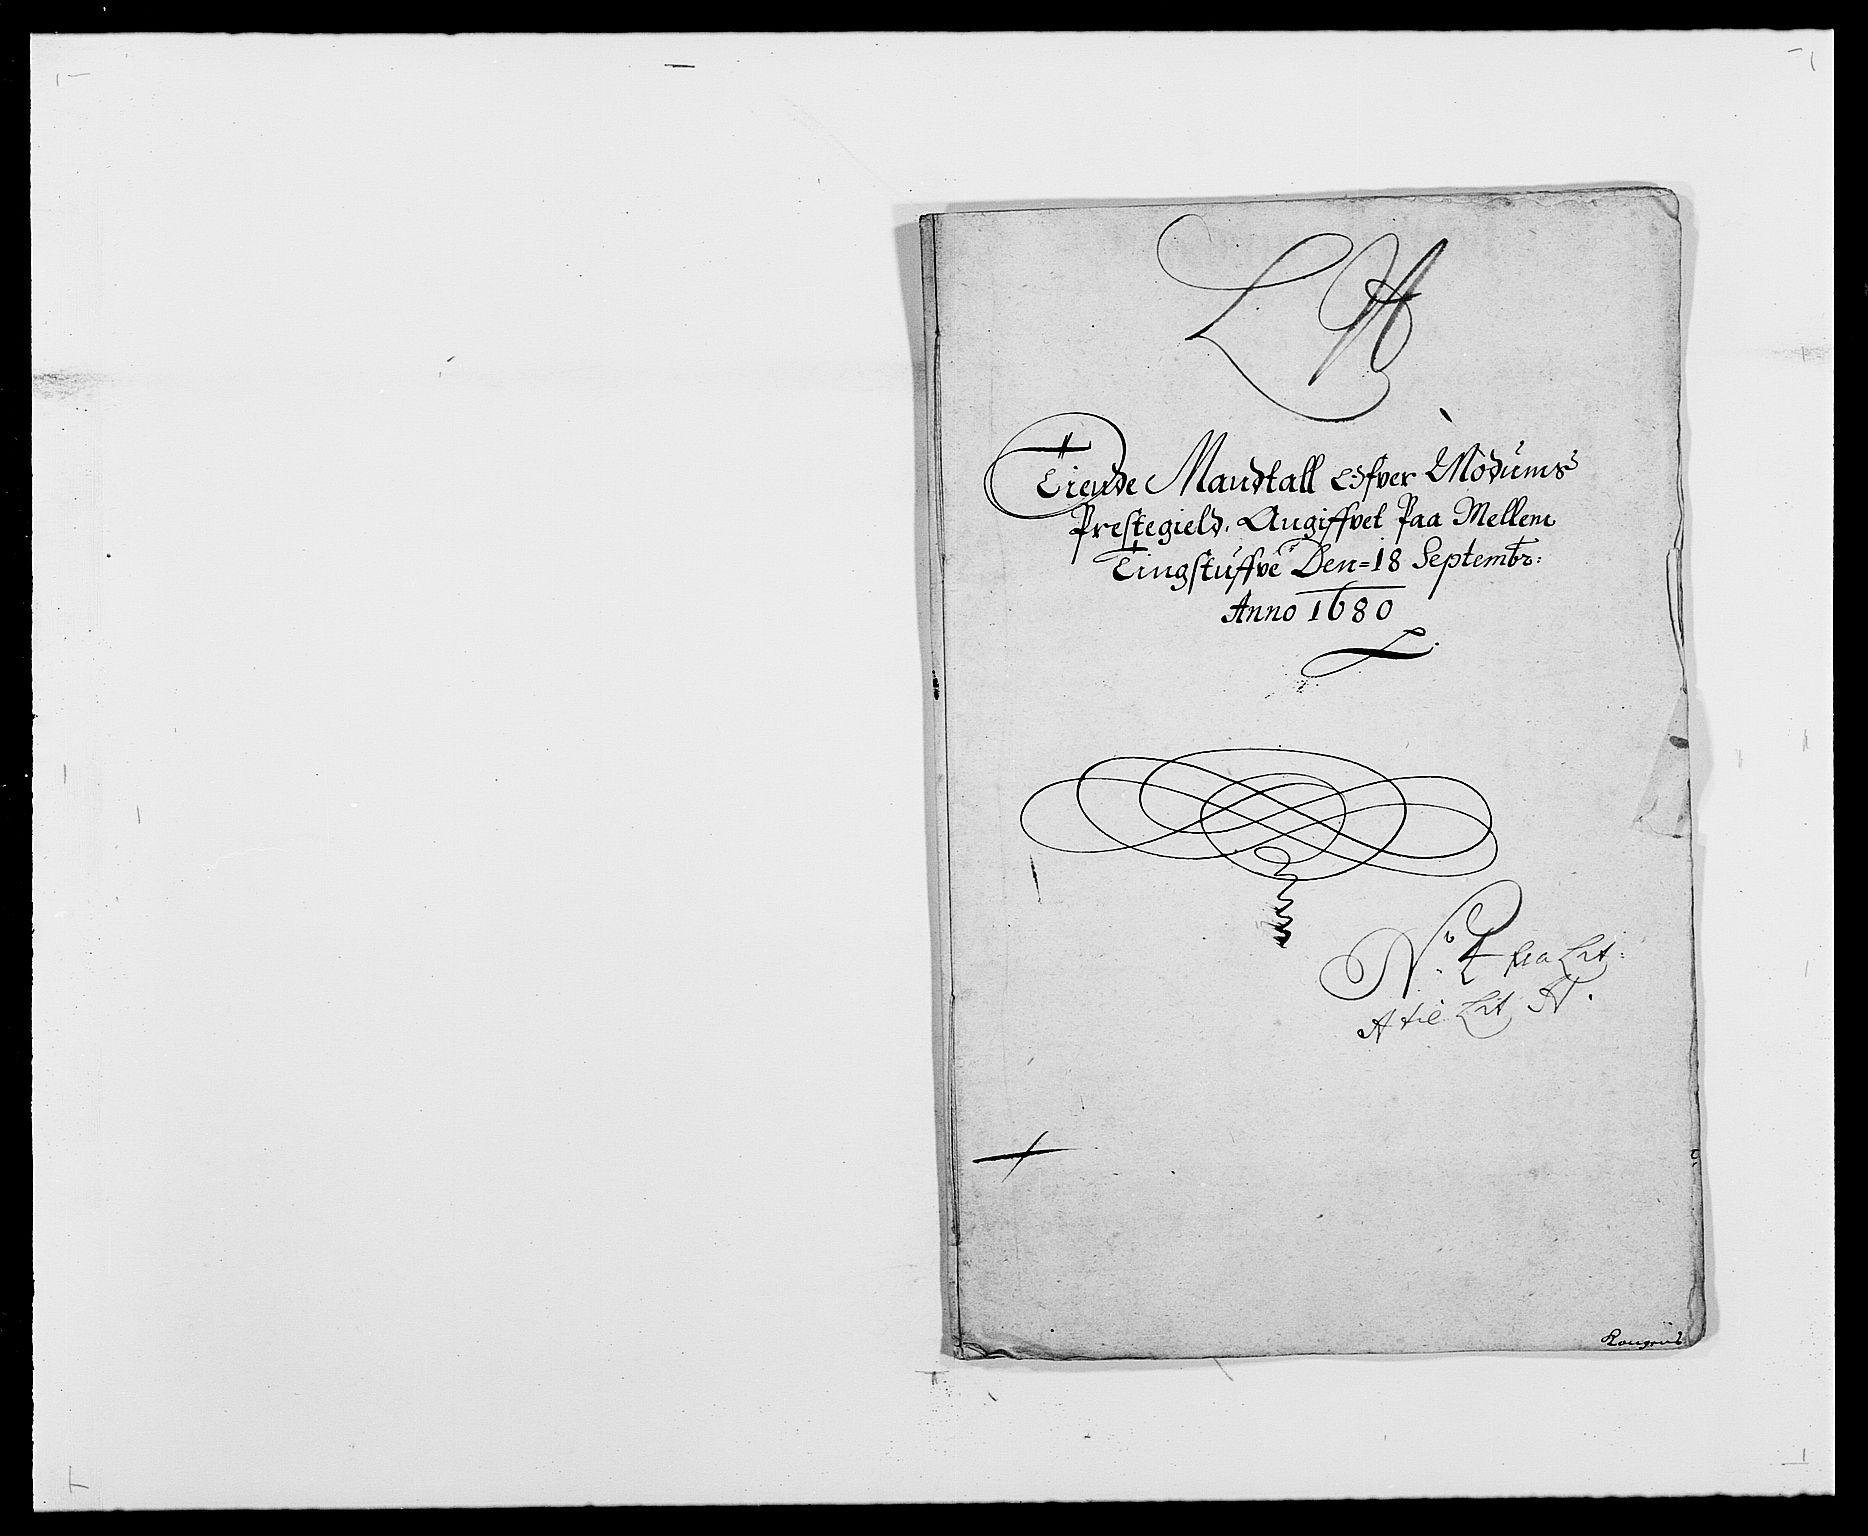 RA, Rentekammeret inntil 1814, Reviderte regnskaper, Fogderegnskap, R25/L1675: Fogderegnskap Buskerud, 1678-1681, s. 155